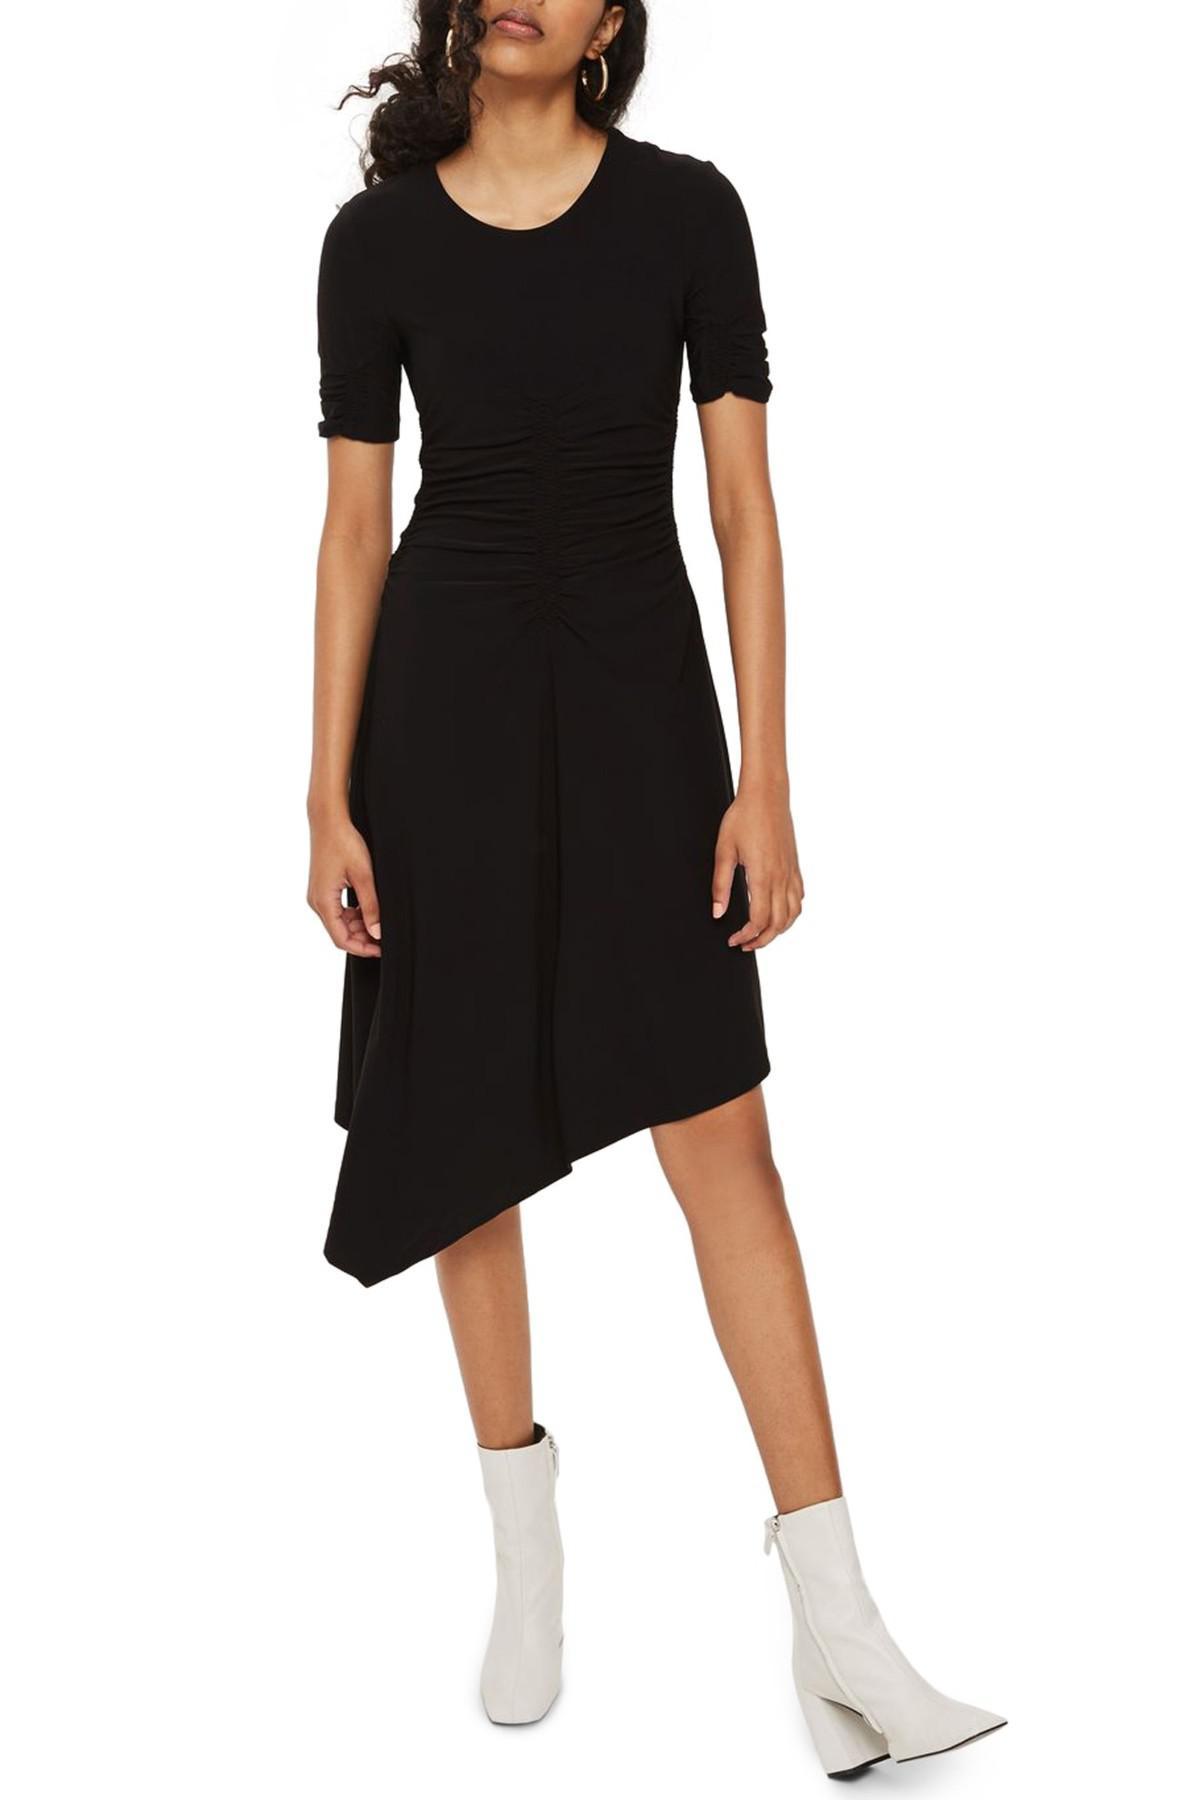 7b62e55d08e TOPSHOP Ruched Asymmetrical Dress in Black - Lyst